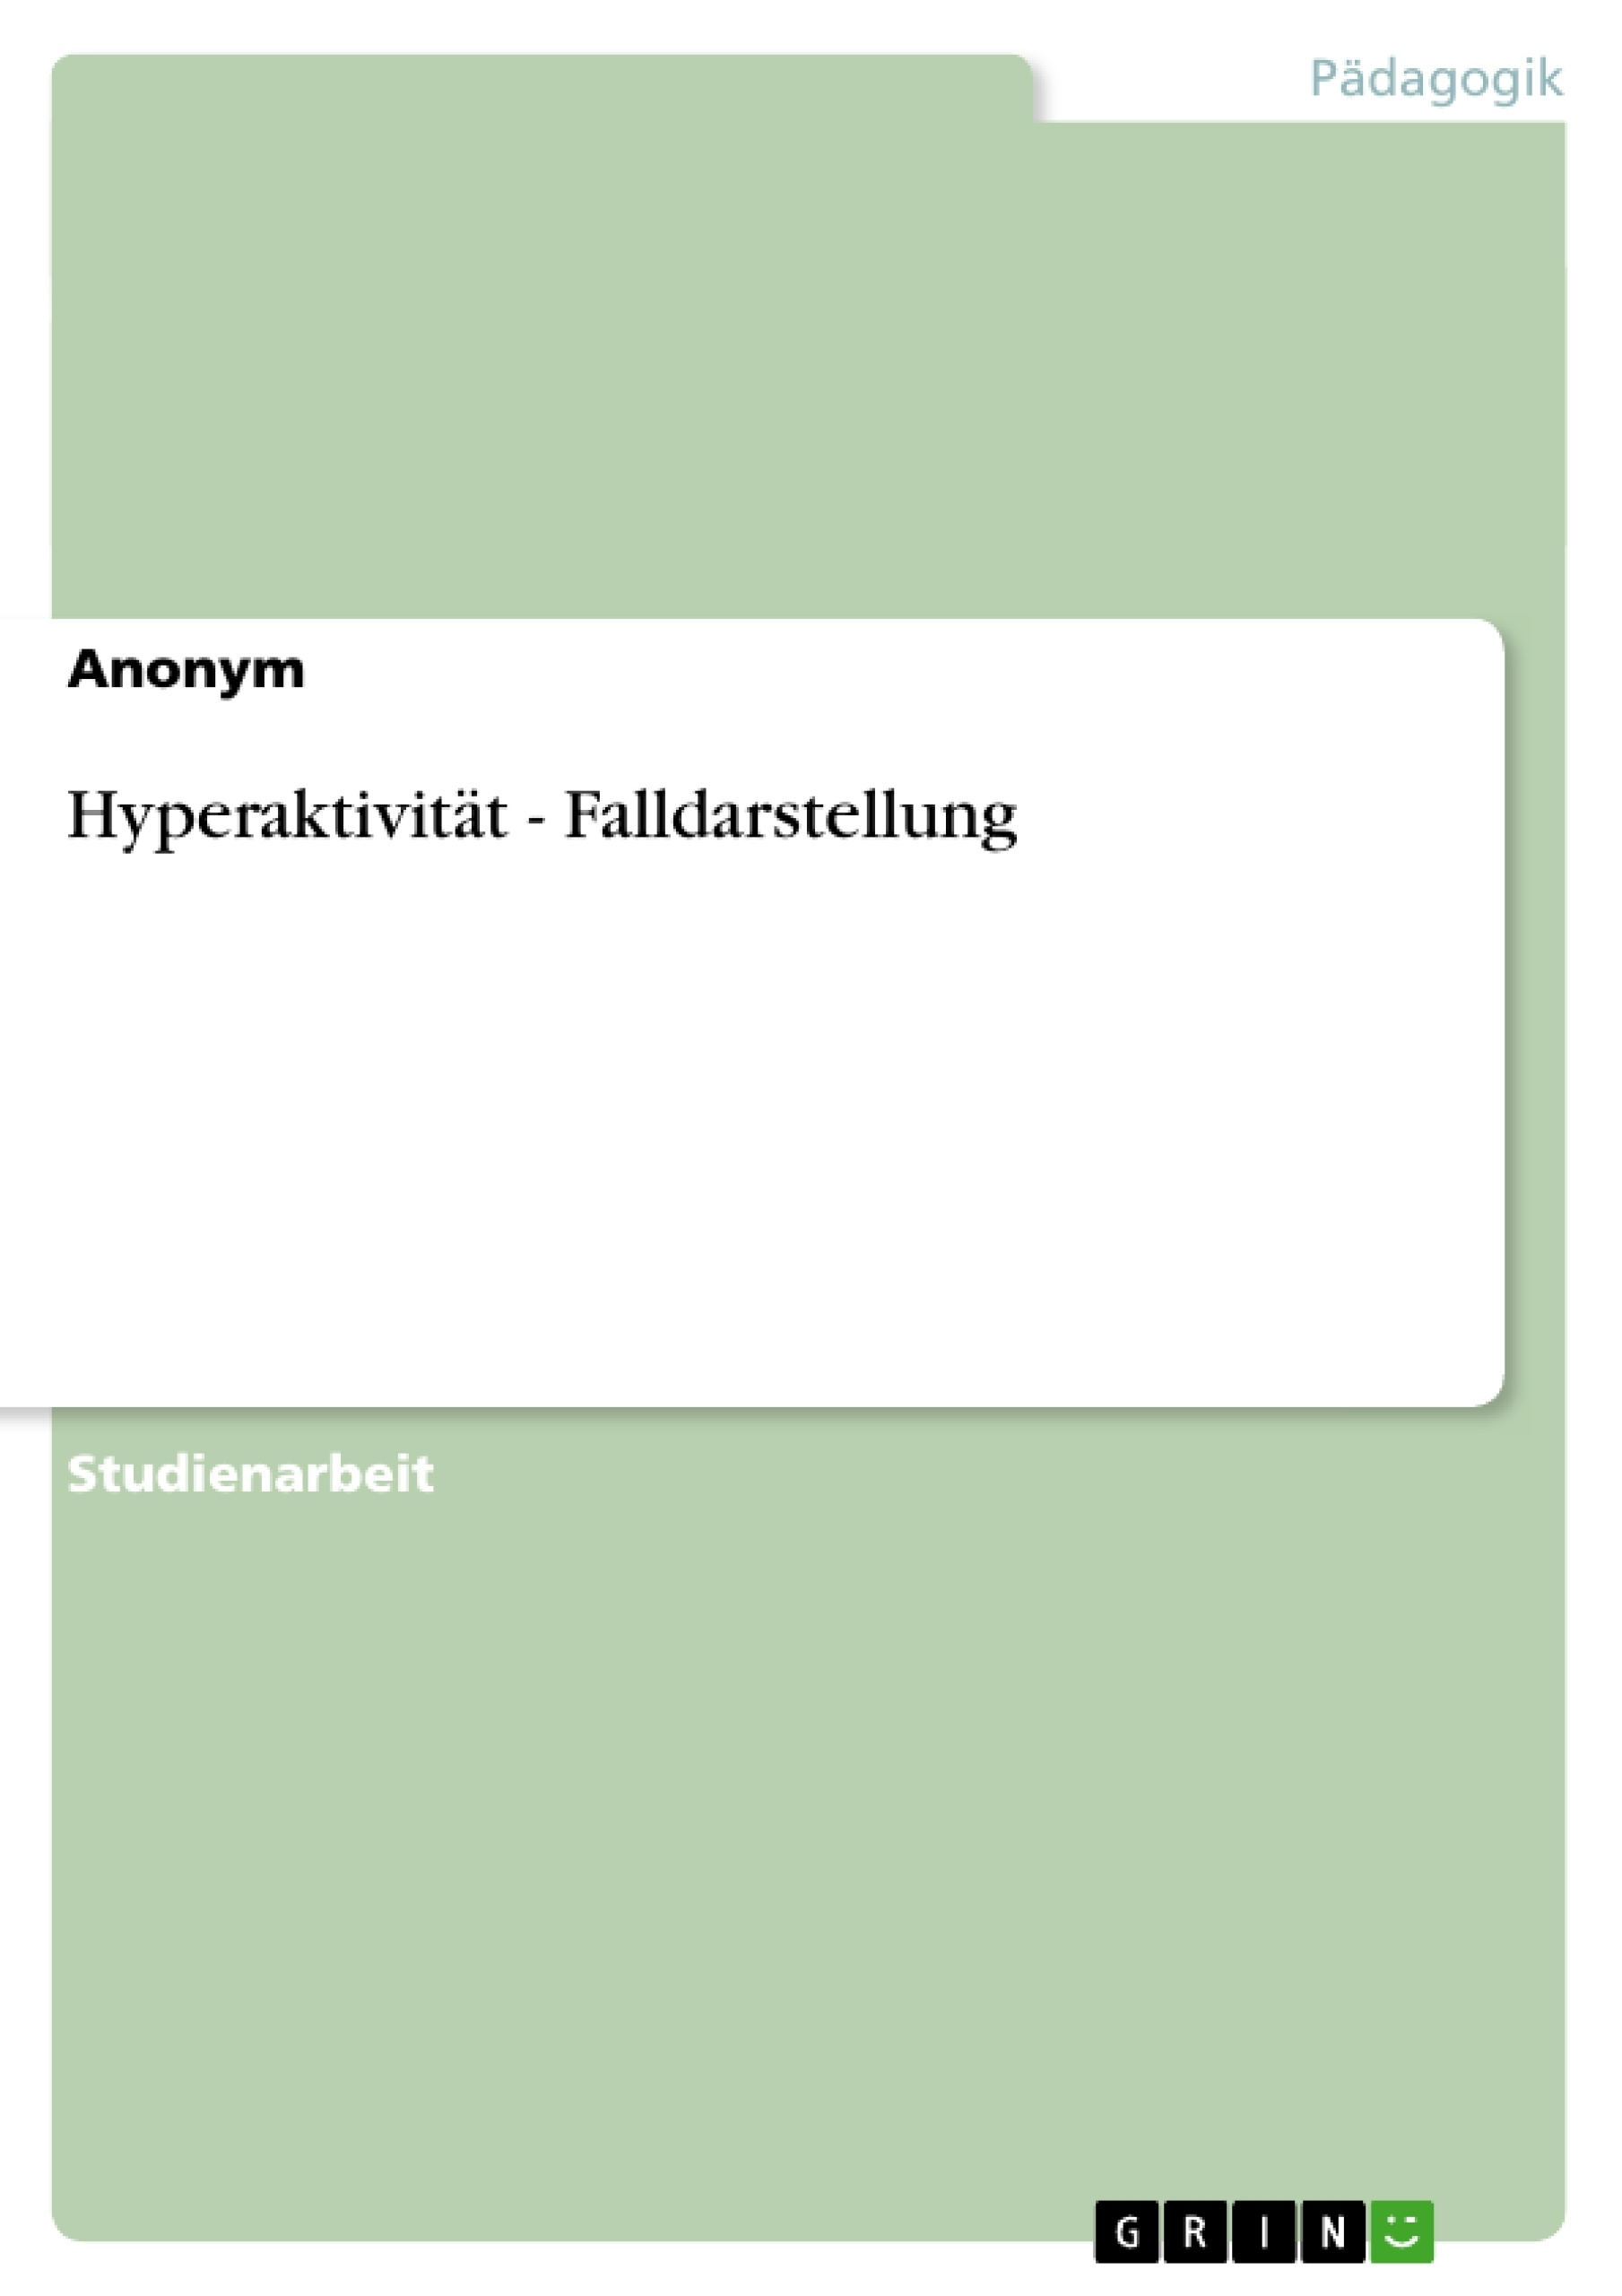 Titel: Hyperaktivität - Falldarstellung